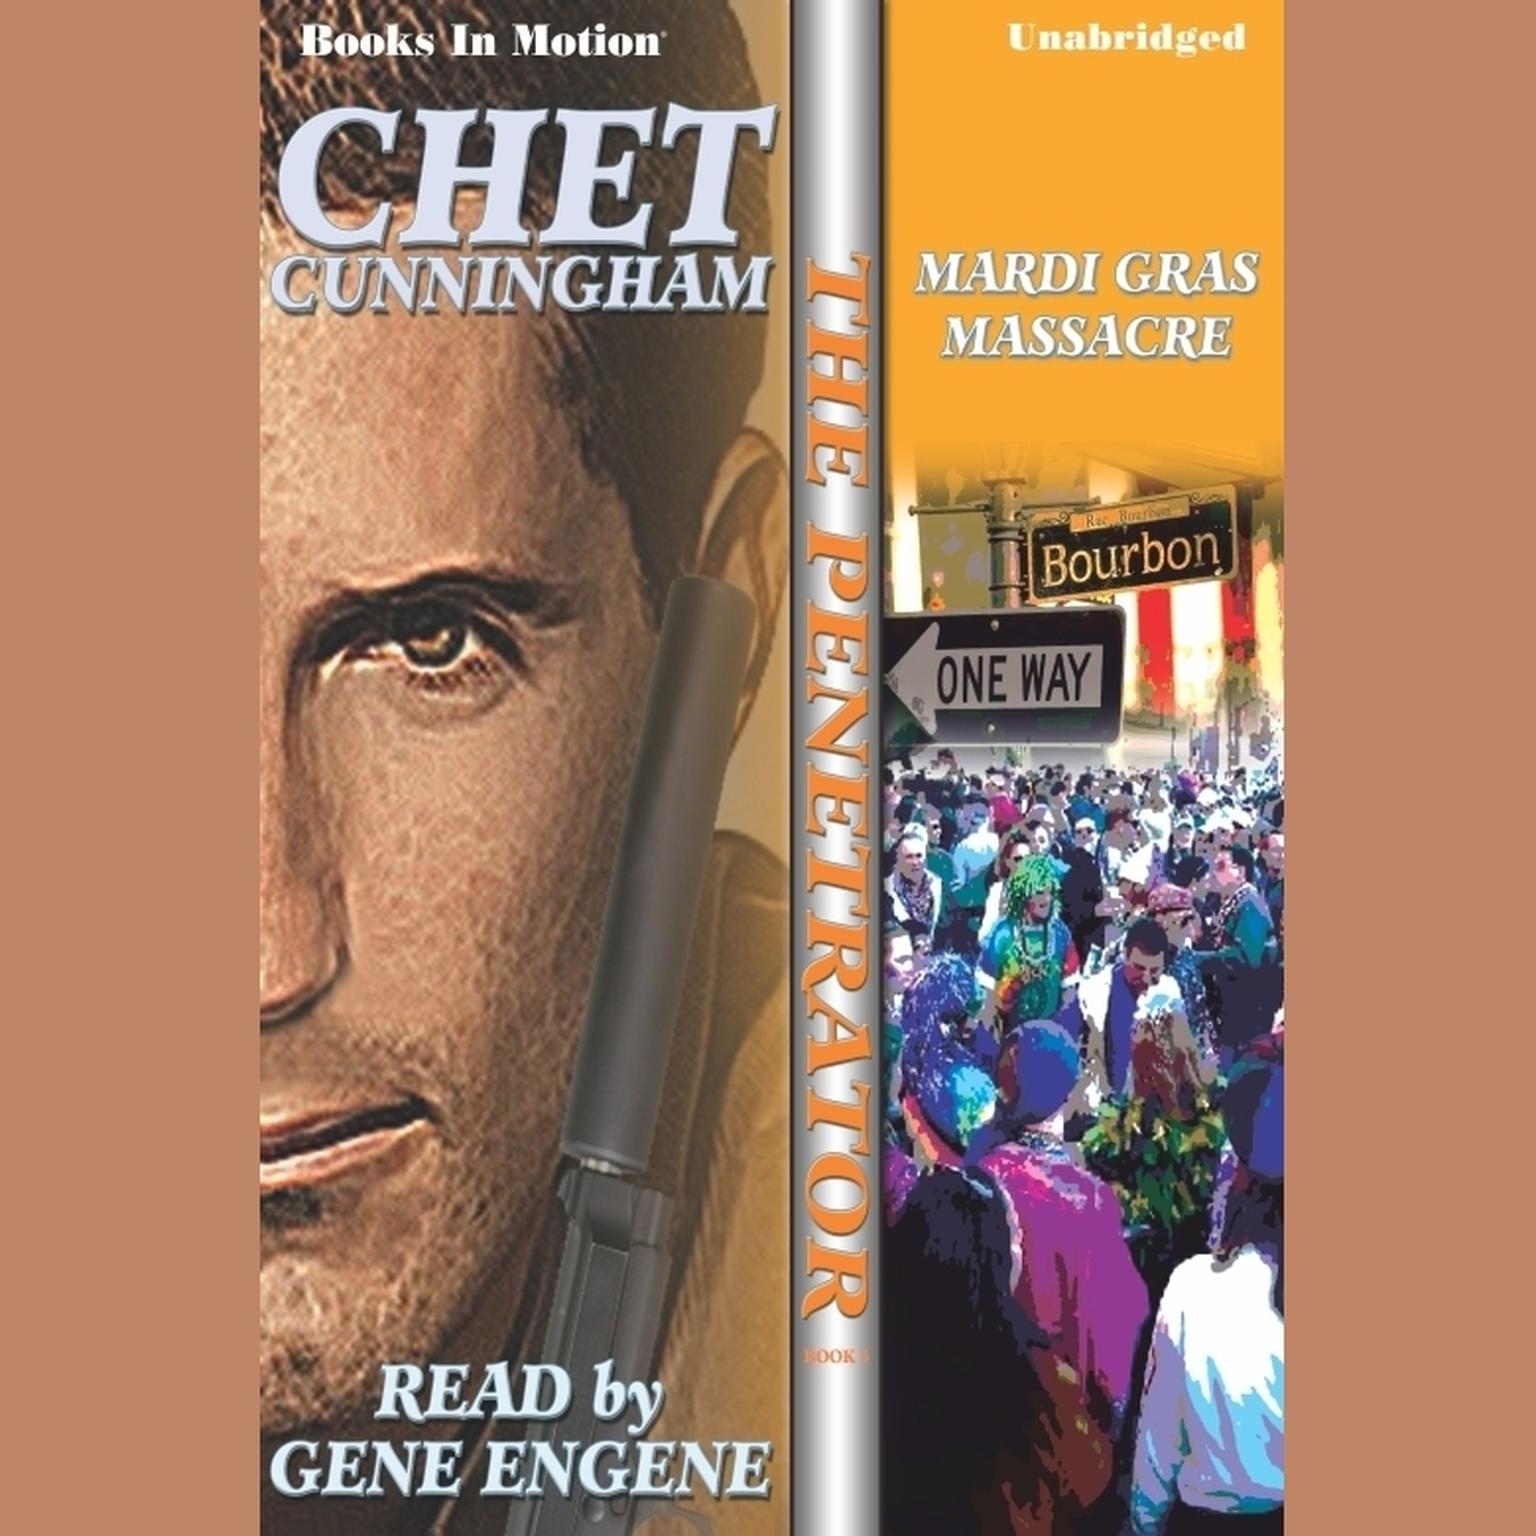 Mardi Gras Massacre Audiobook, by Chet Cunningham